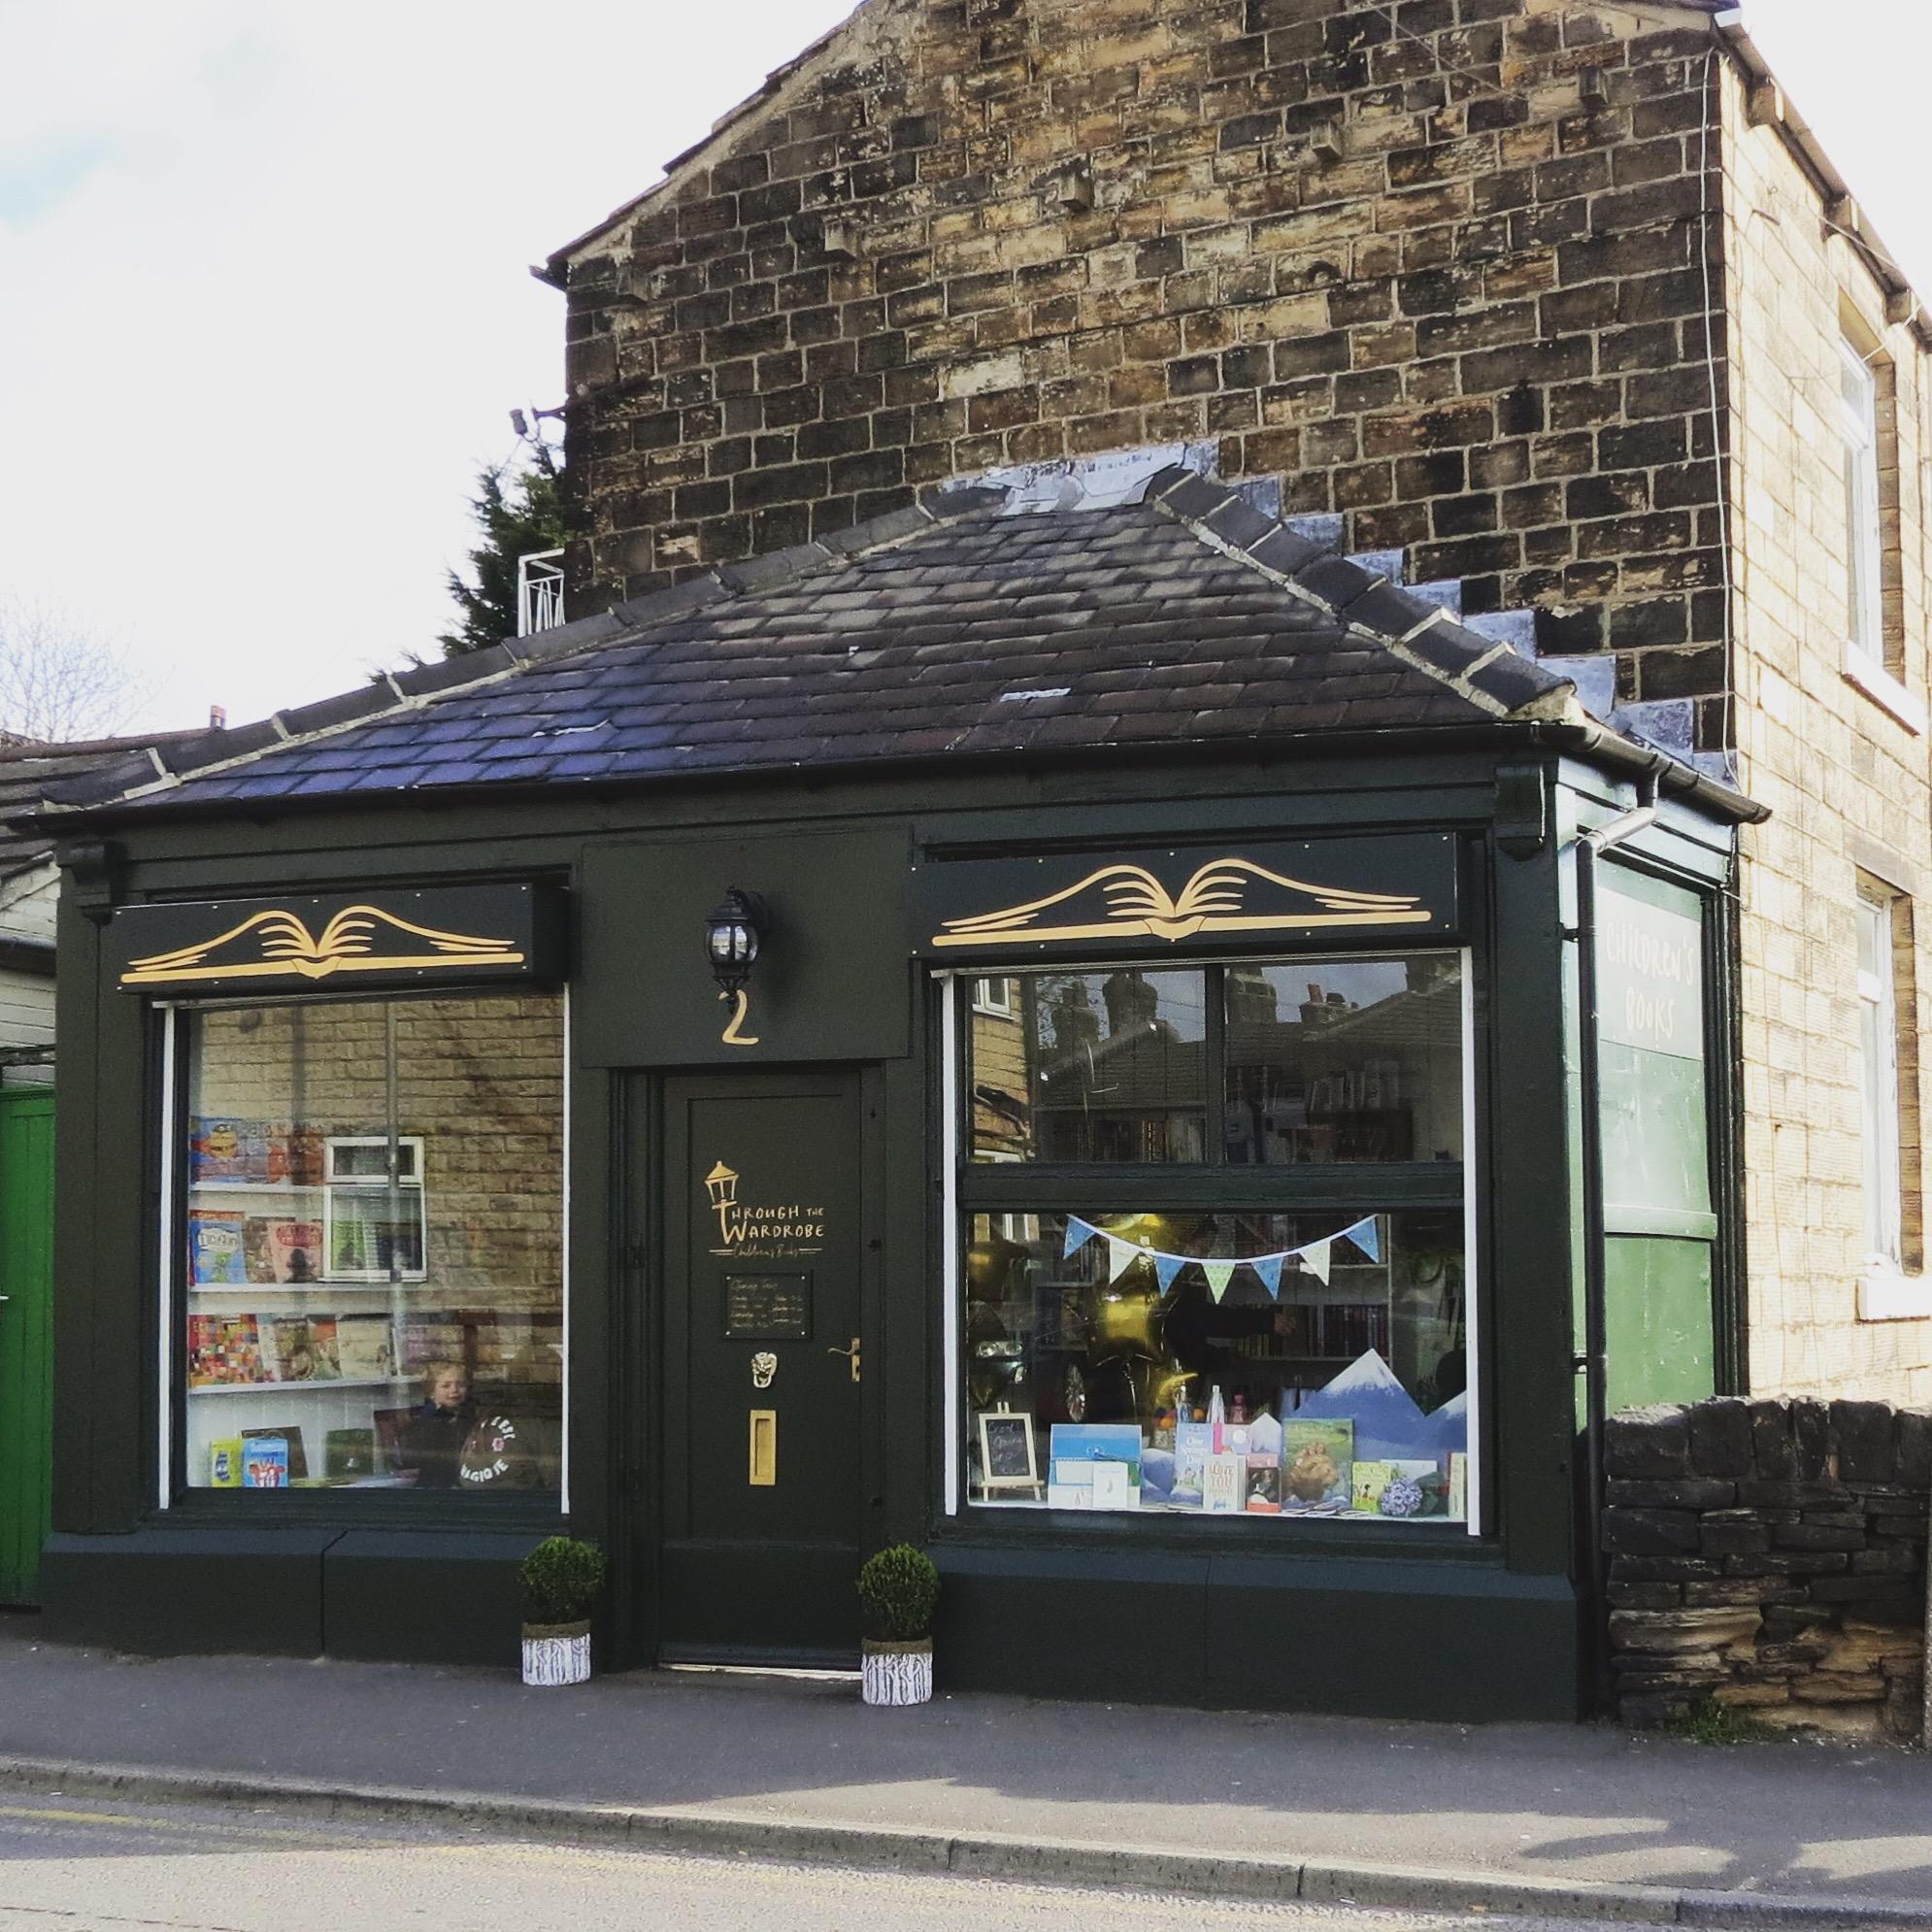 Exterior of the beautiful Through the Wardrobe Children's Bookshop in Mirfield, West Yorkshire